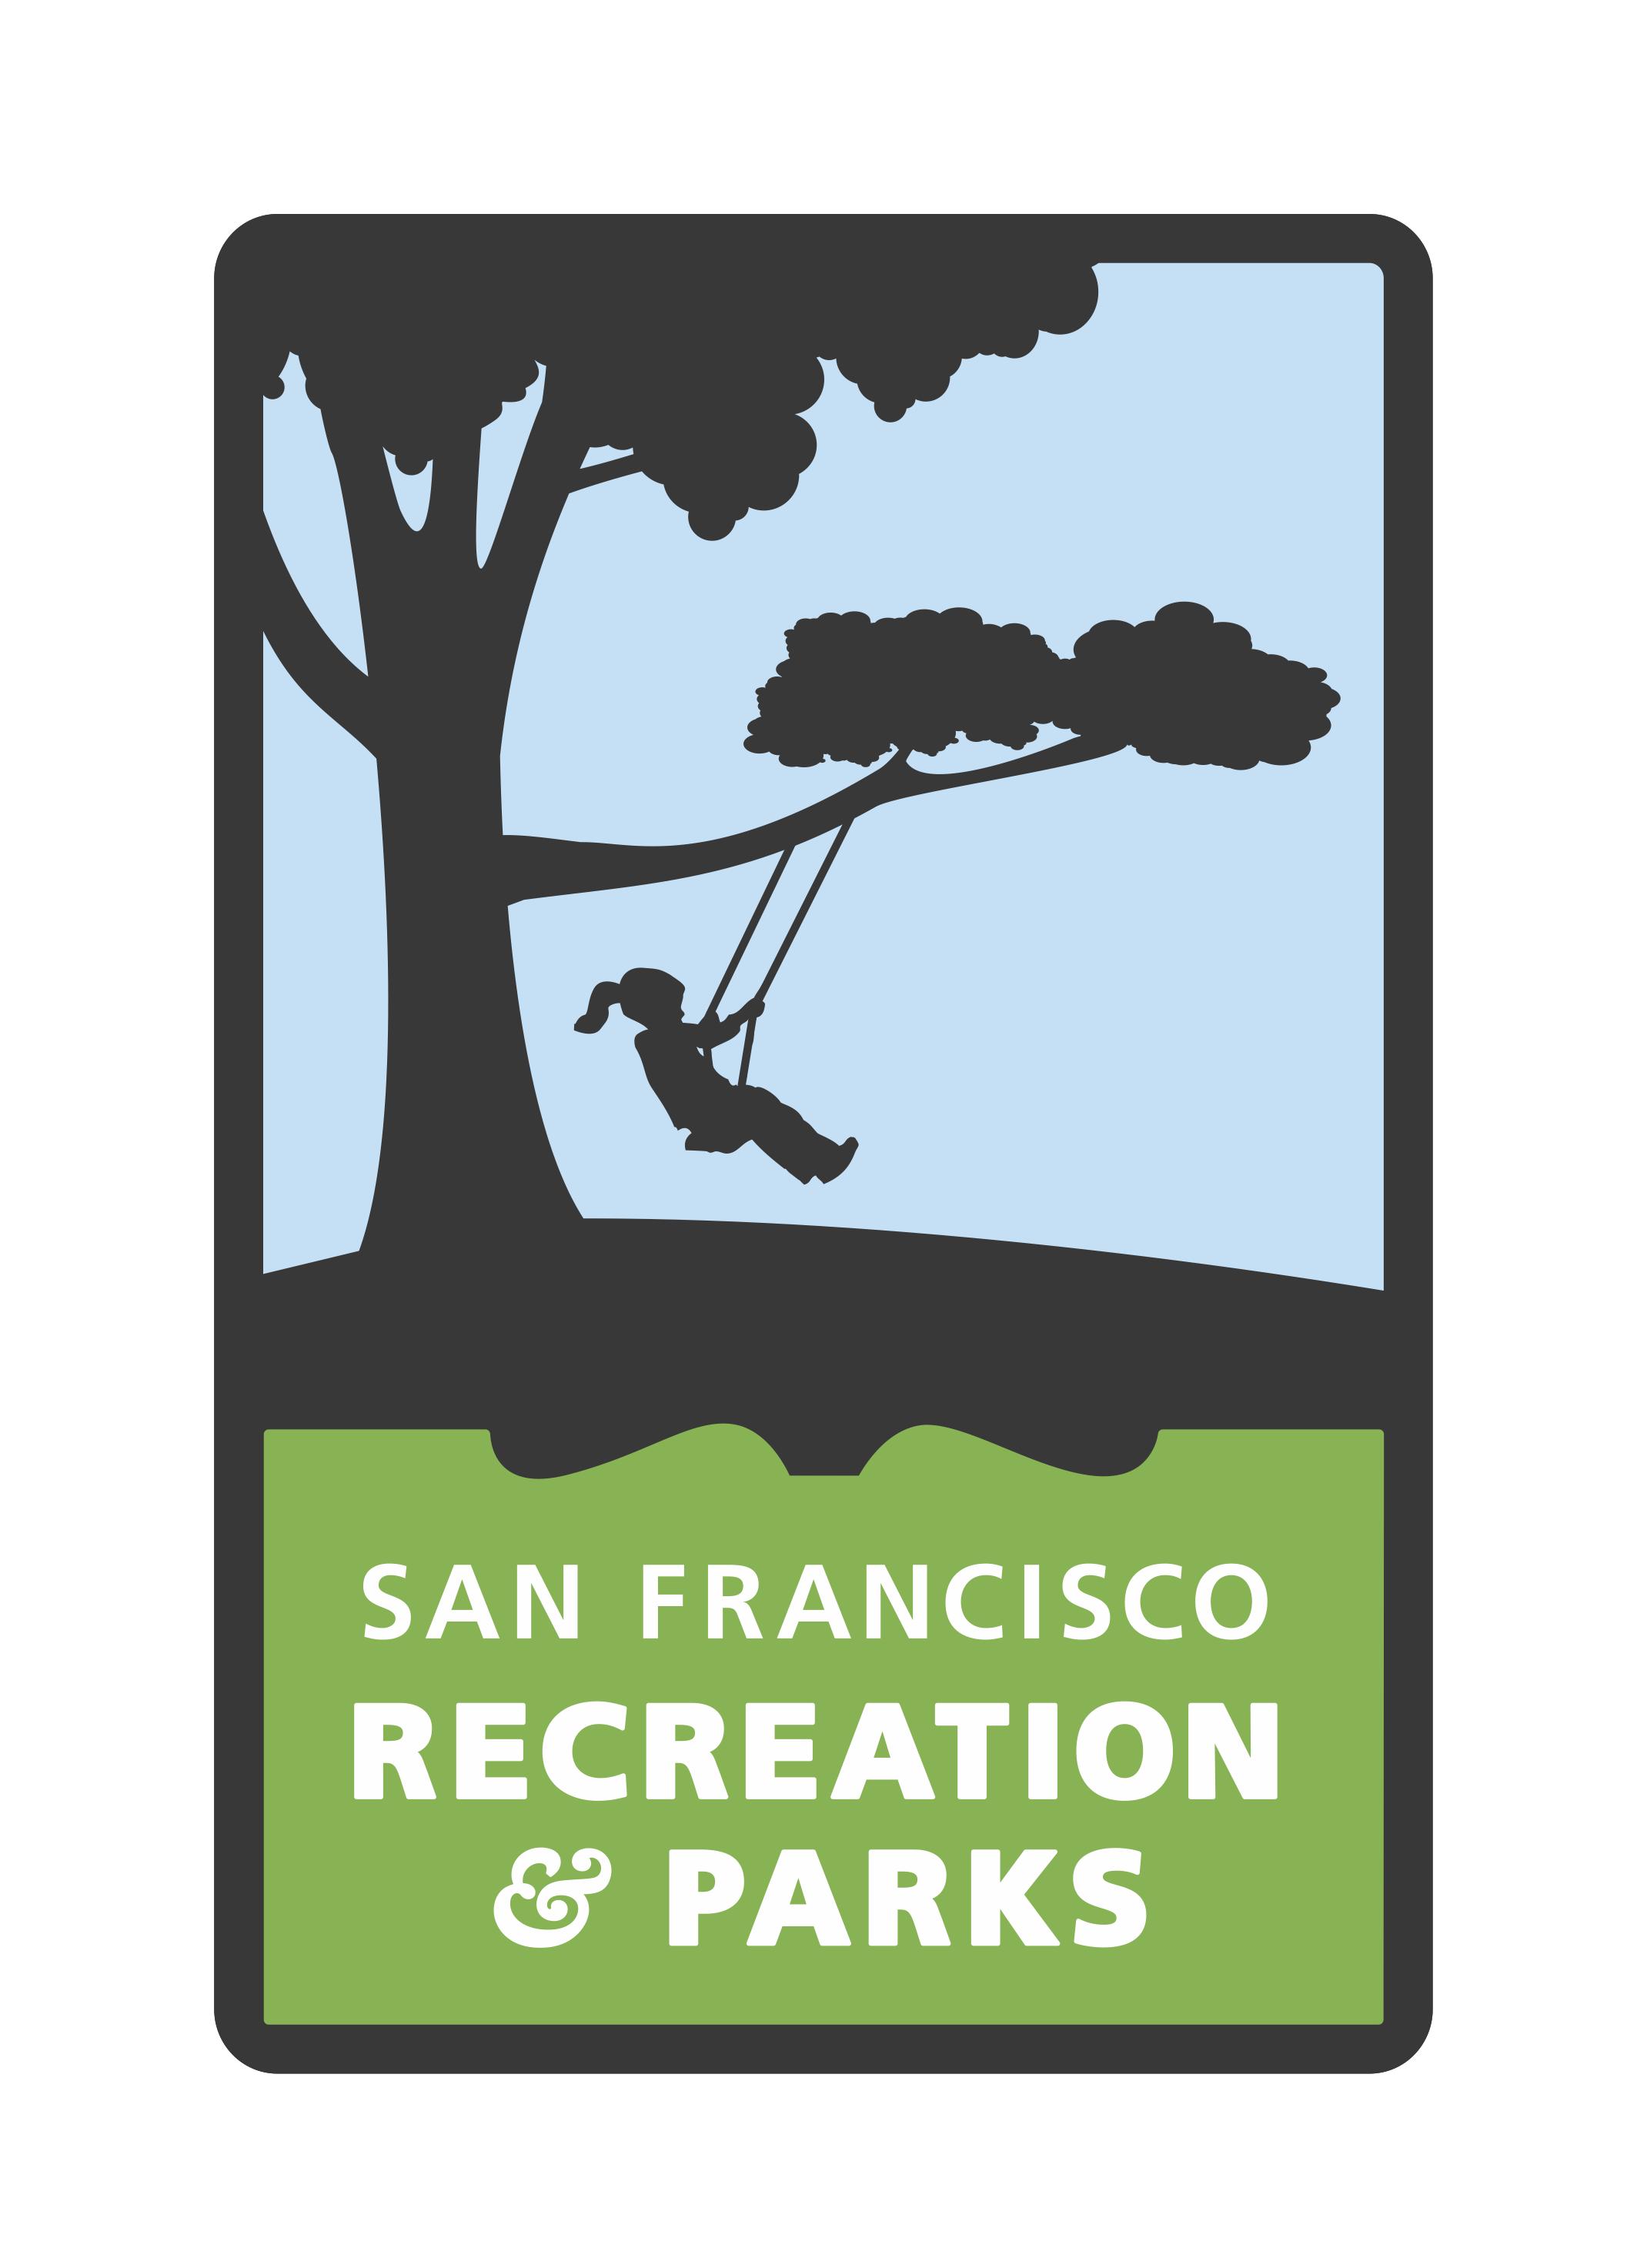 San Francisco Recreation & Parks logo